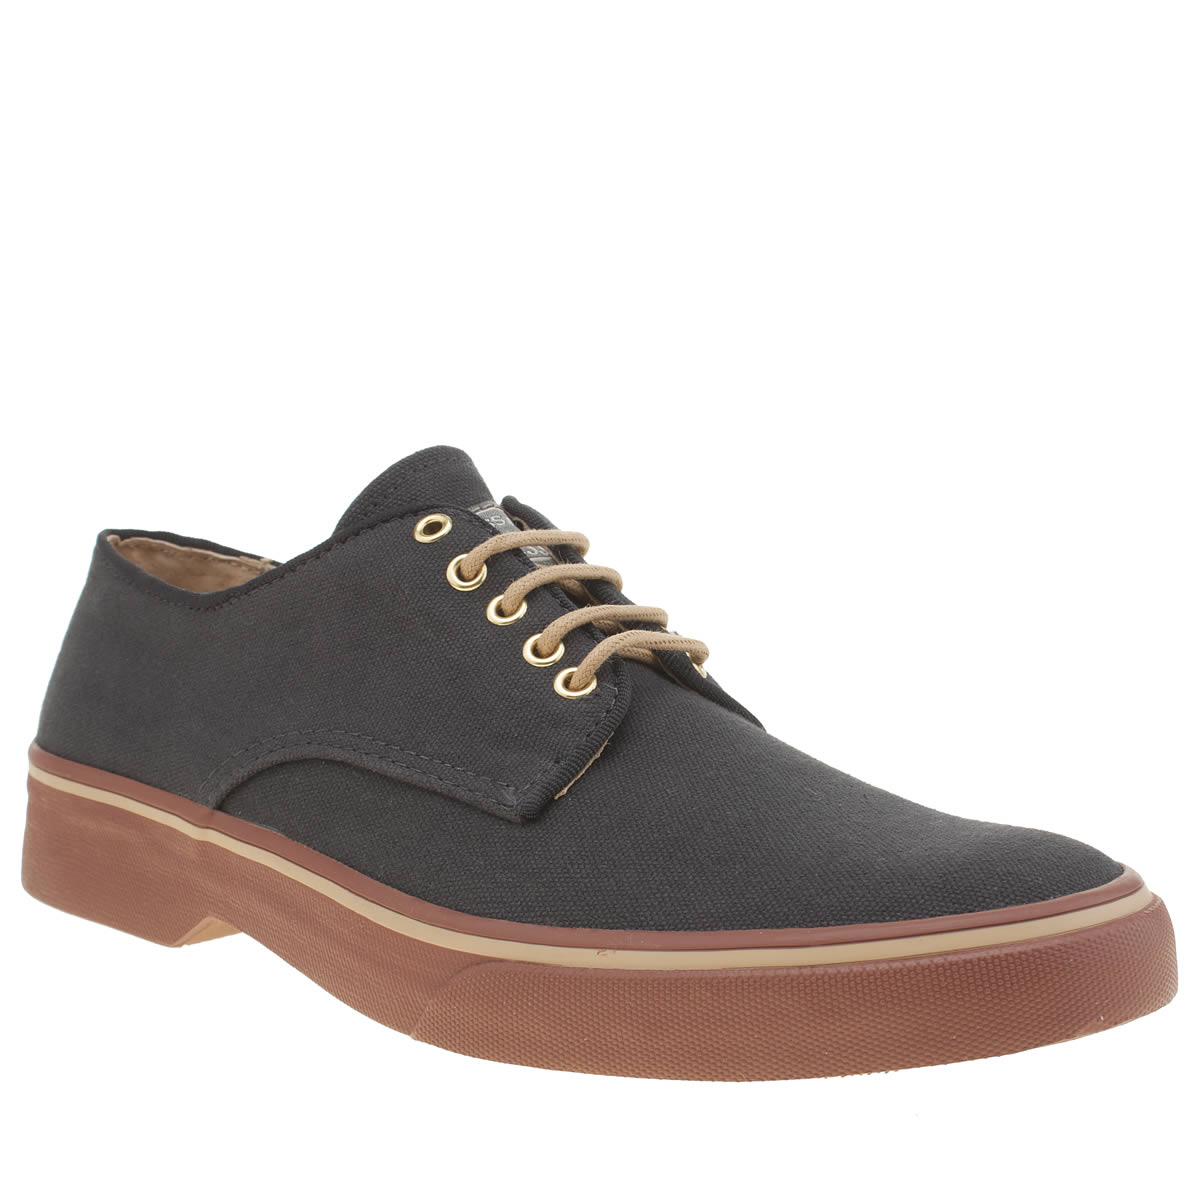 bass Bass Navy Scholar Stanford Derby Shoes